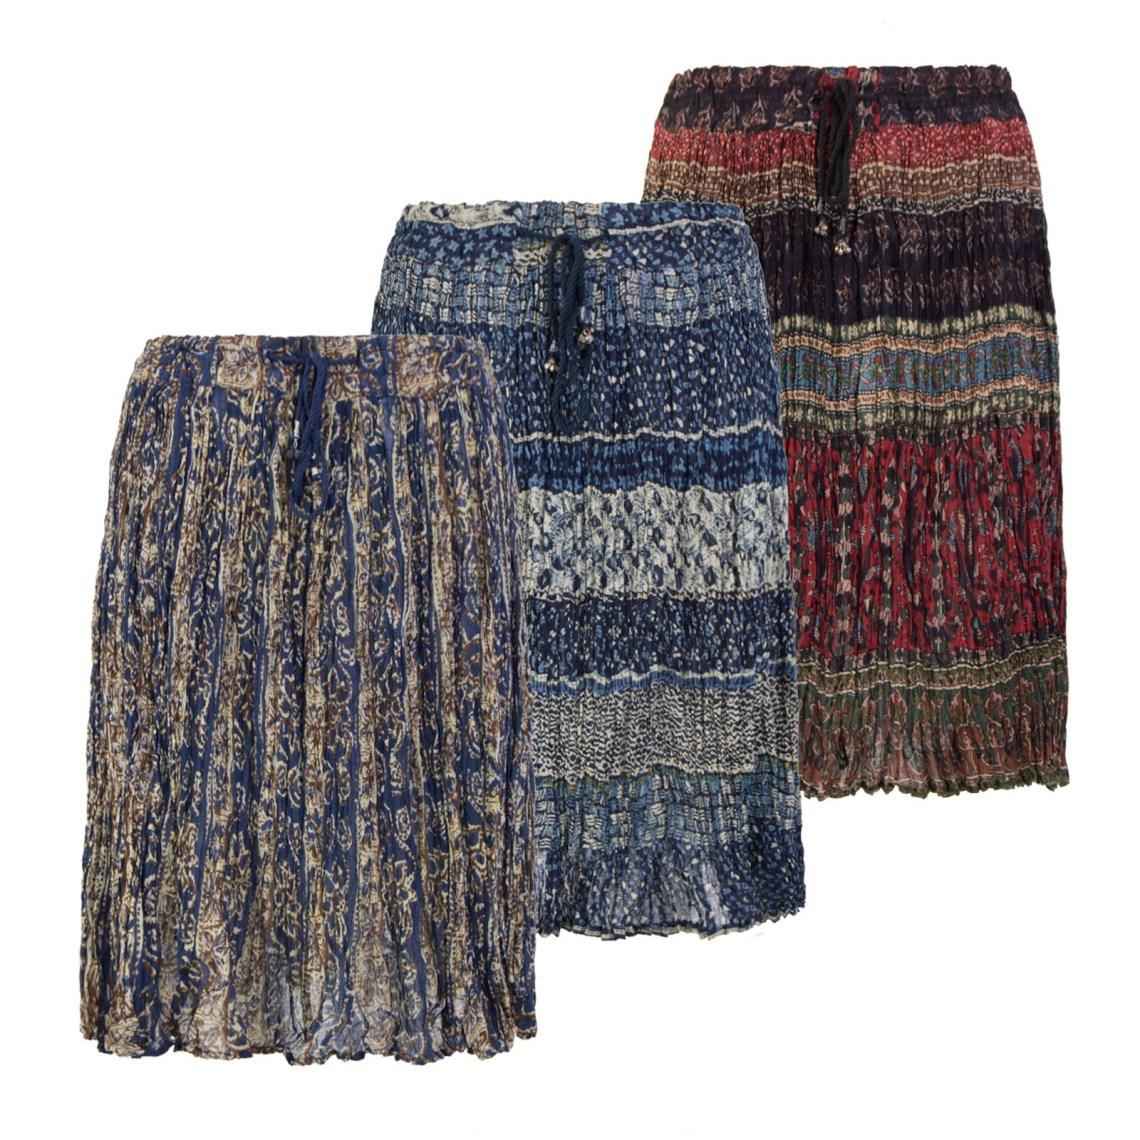 Wholesale Joblot of 20 Ladies 100% Cotton Ruffle Frill ...